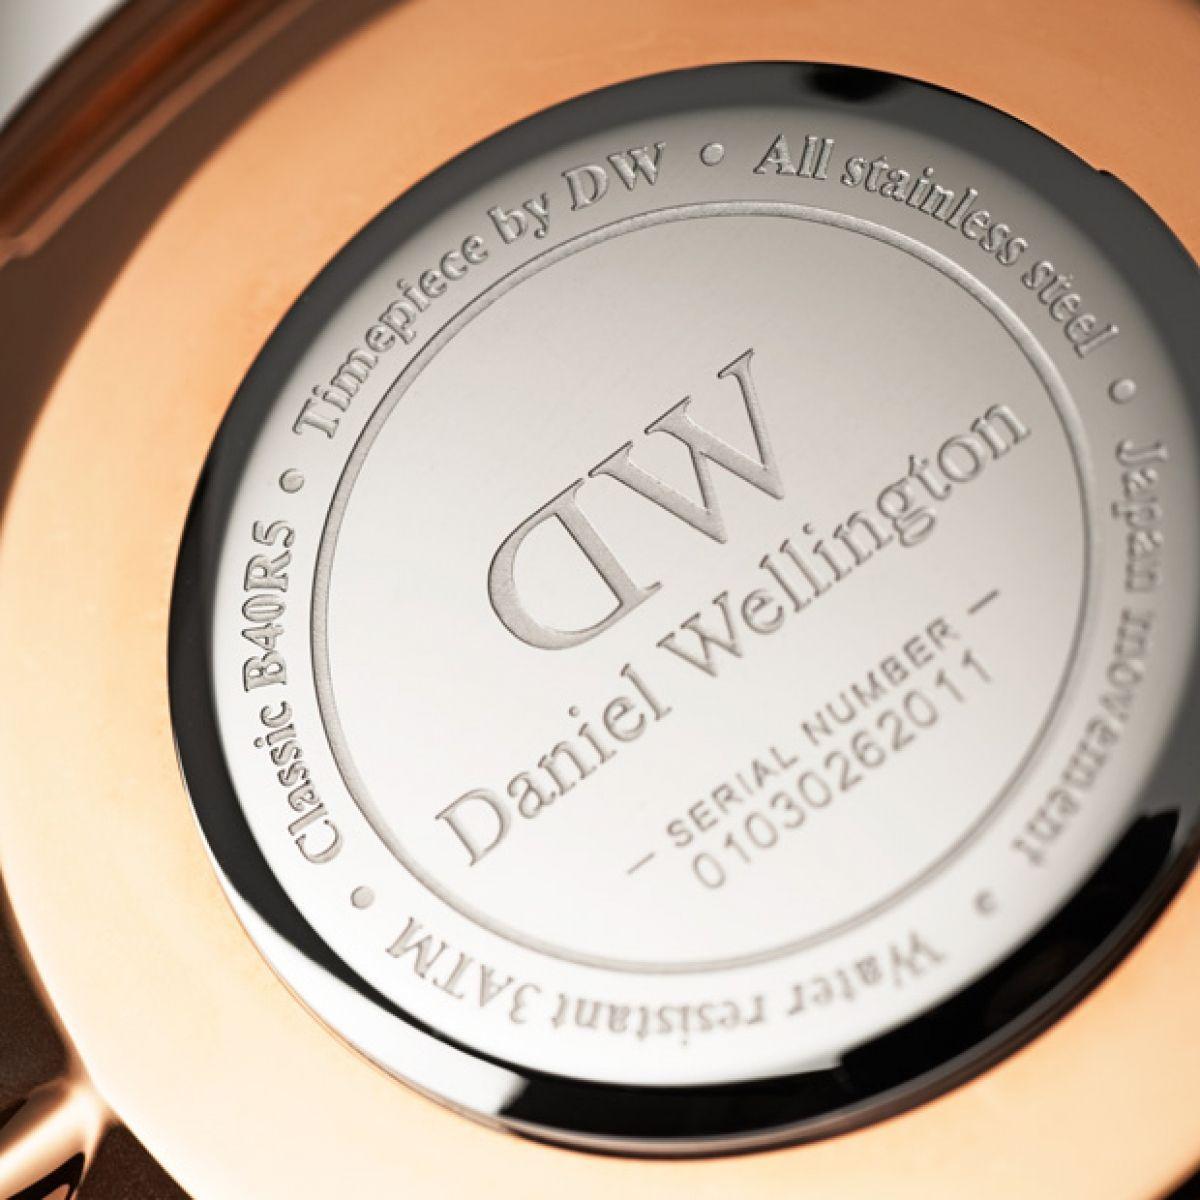 dw官网 dw手表官网 dw中国官网 dw官方旗舰店 DW DW官网  W Classic Durham RG 40mm